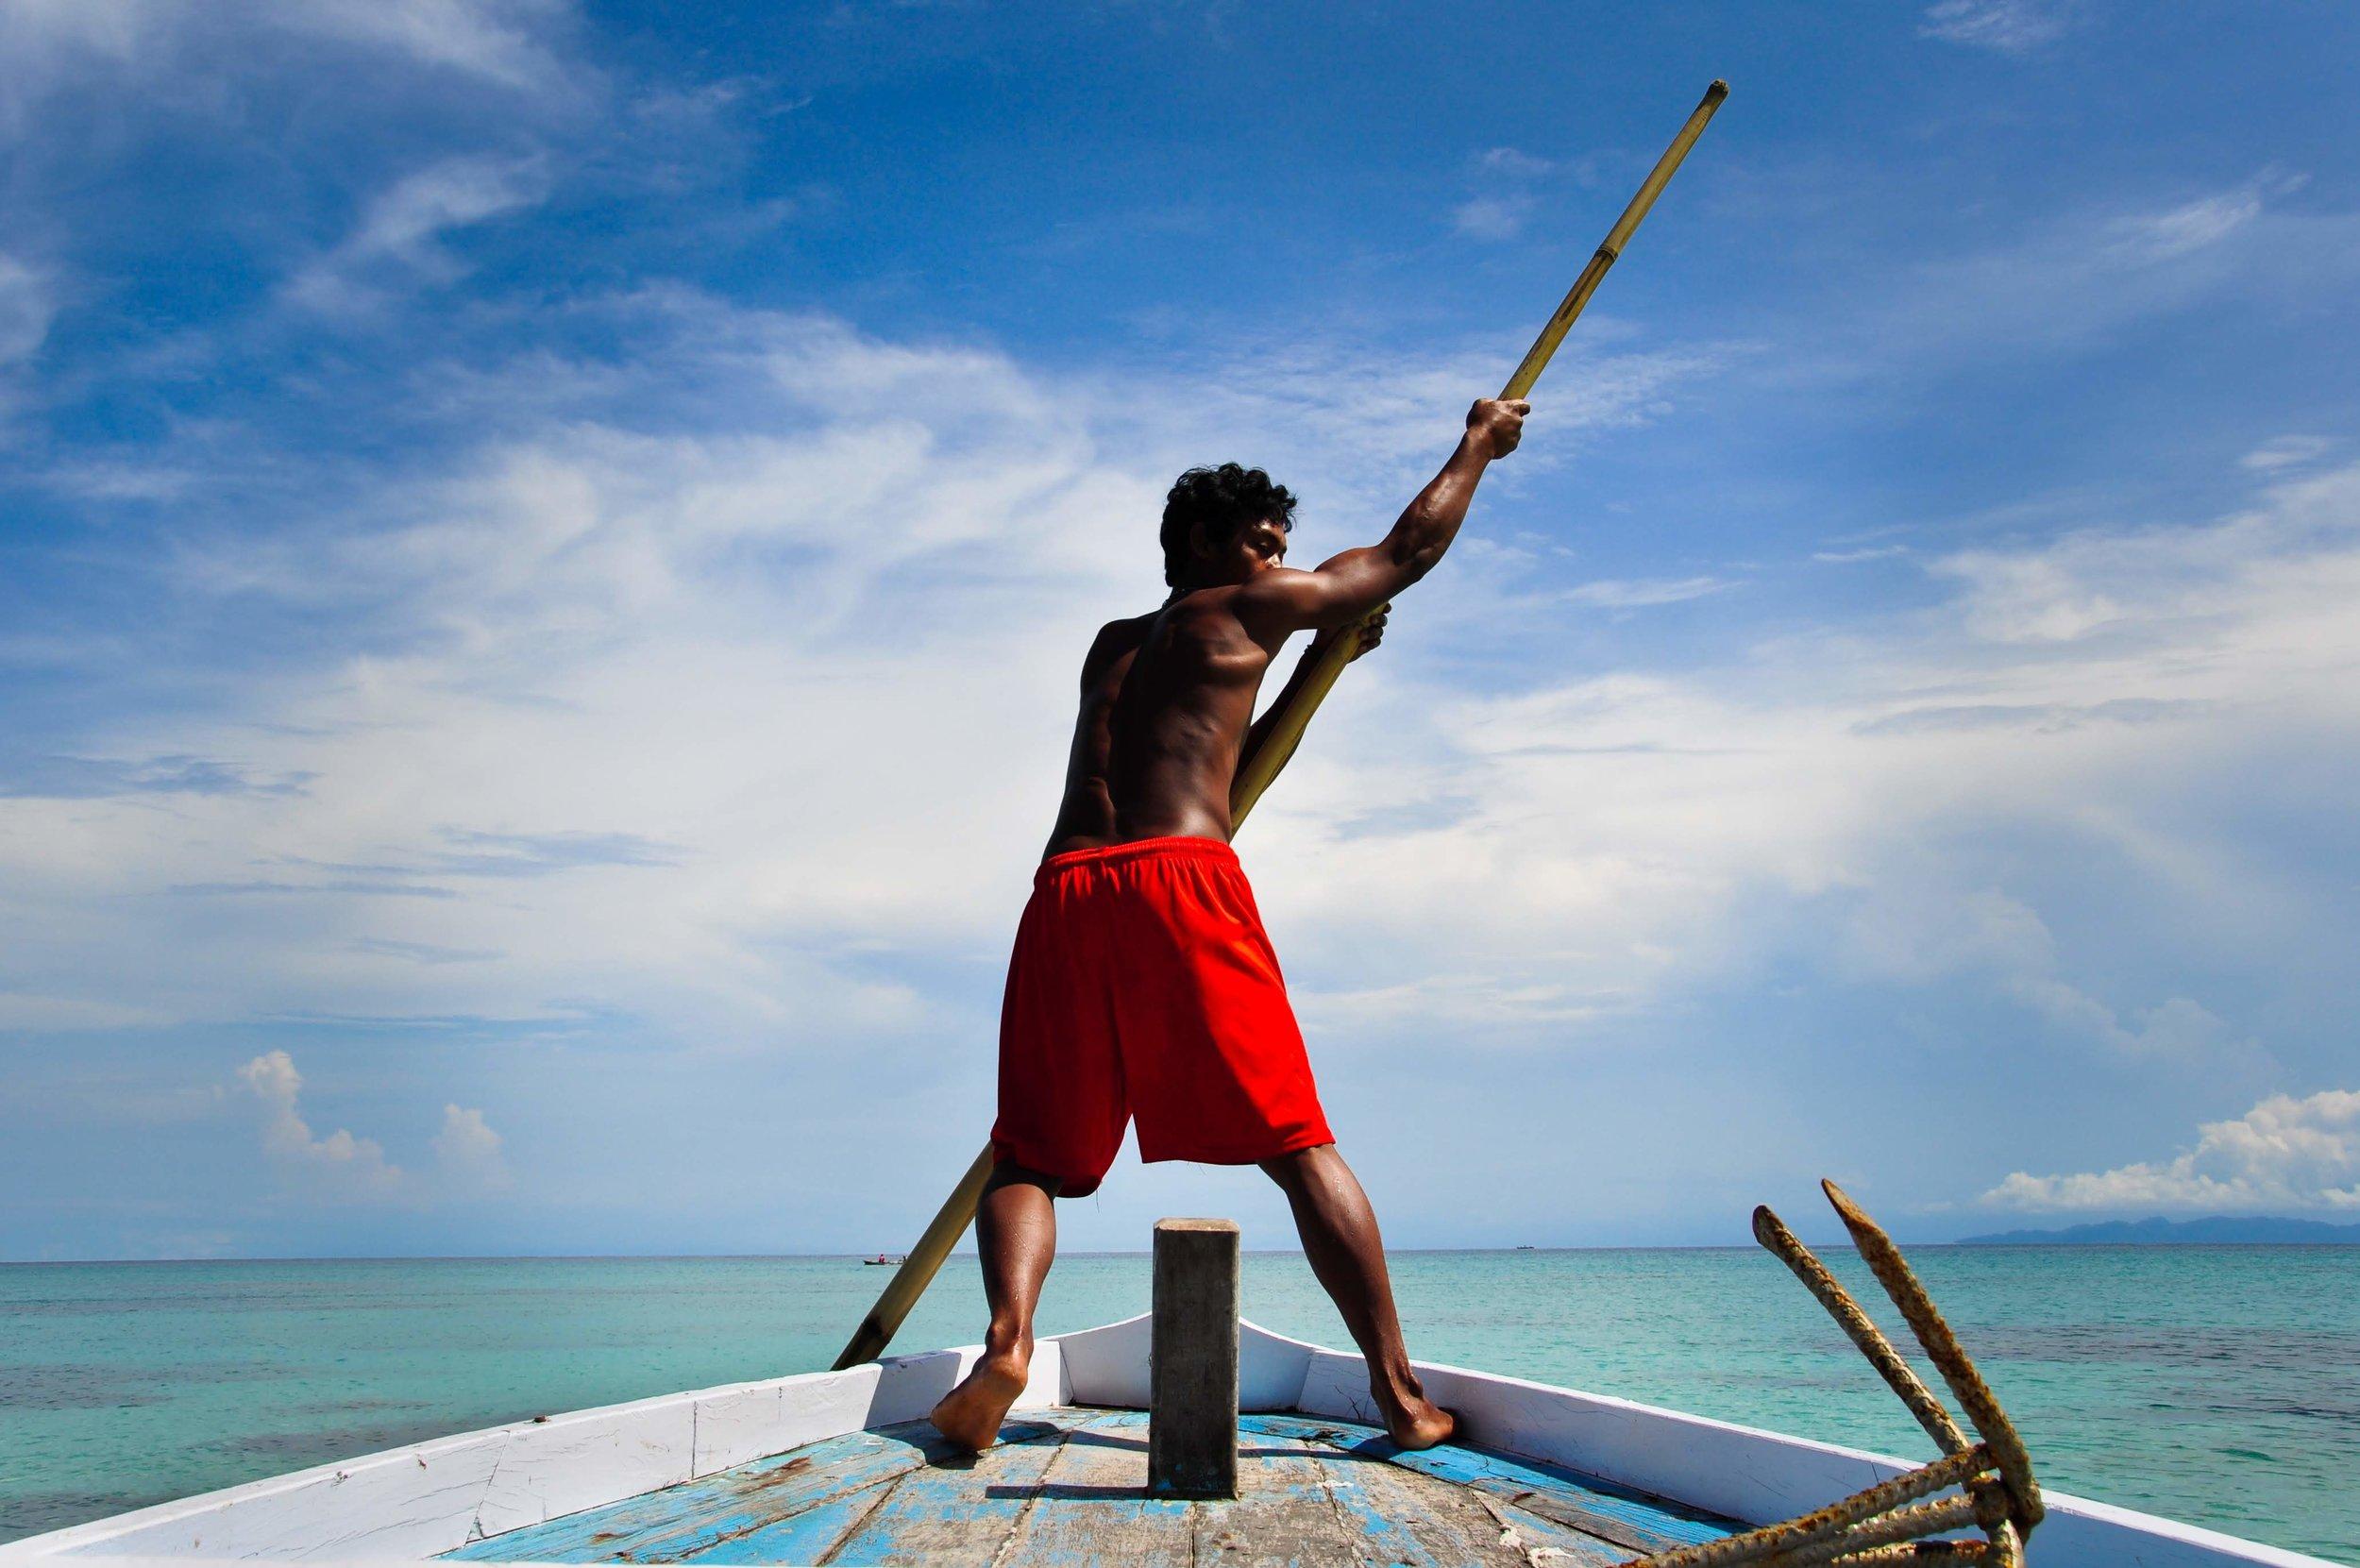 boatman-togean-islands_5709298042_o.jpg